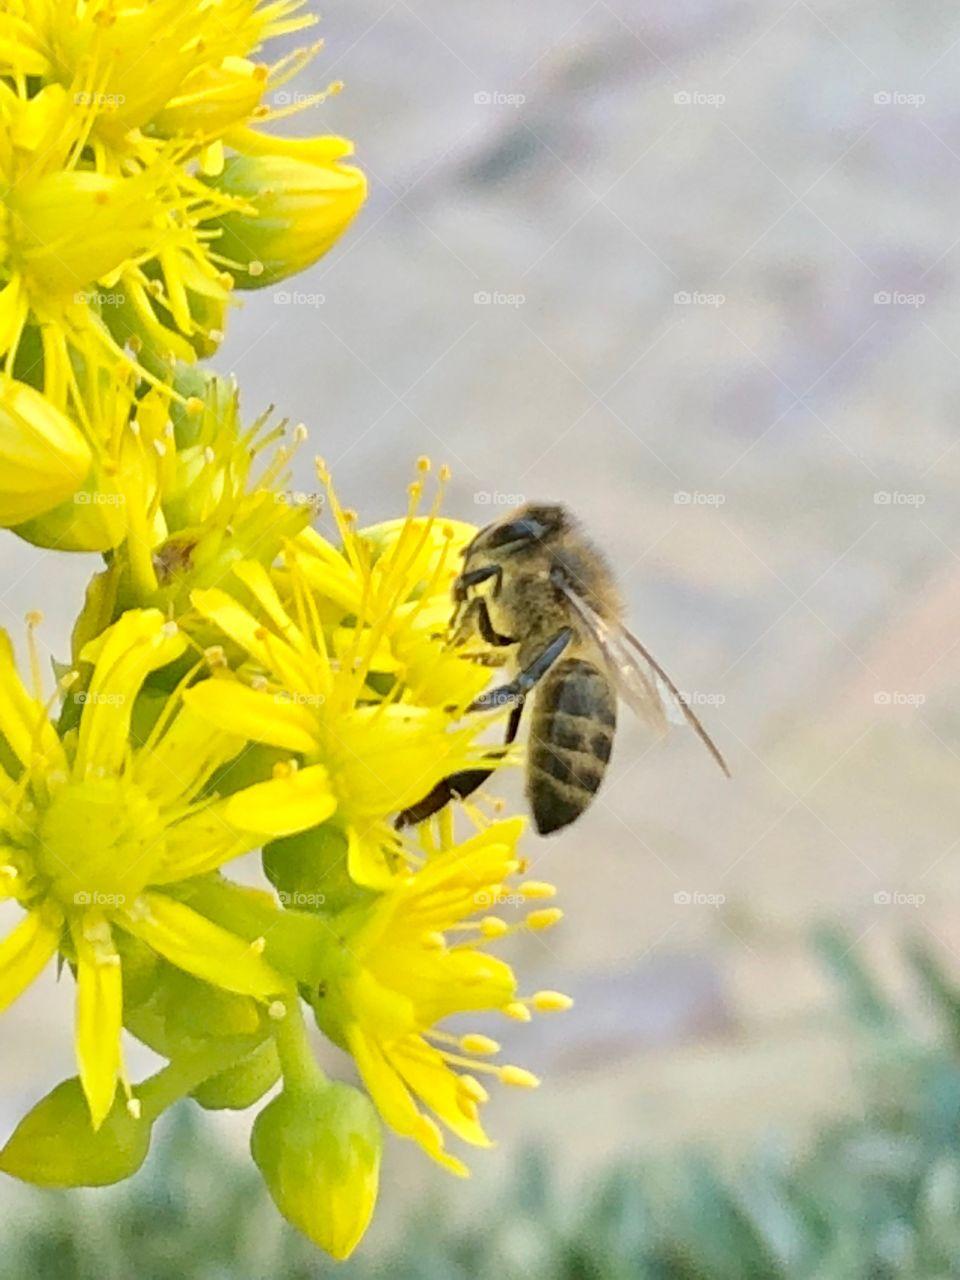 Honey by bee